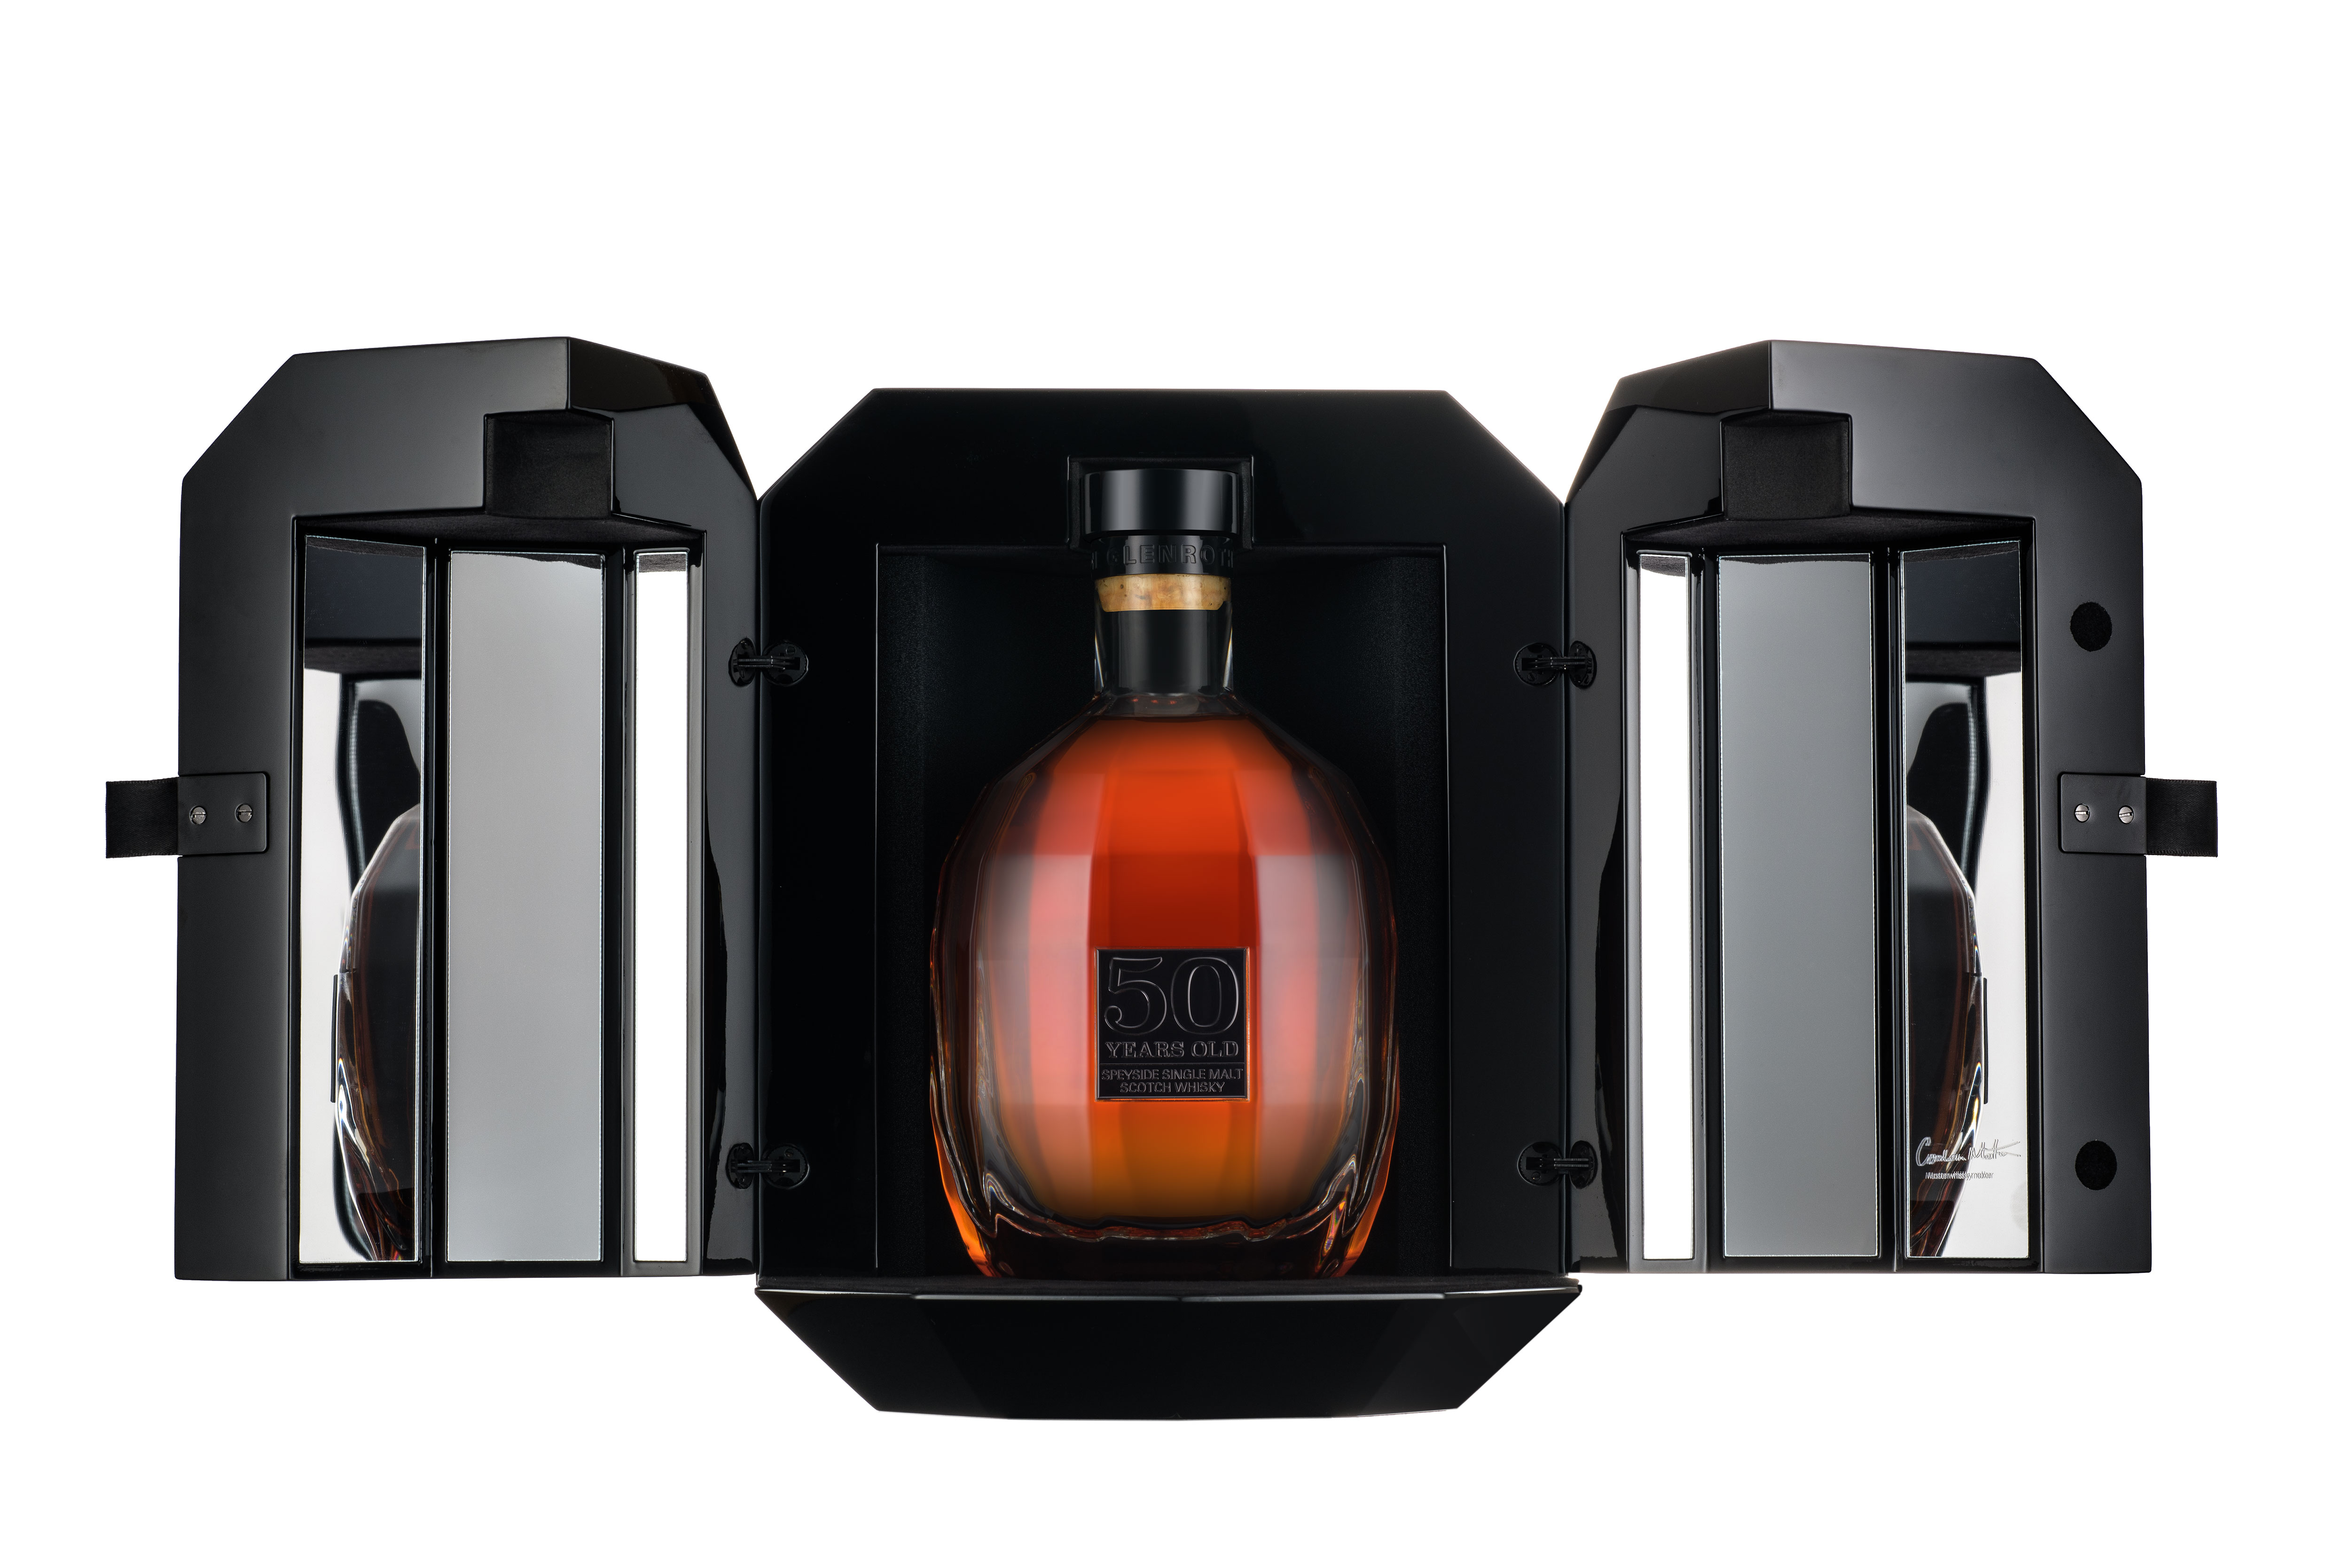 The Glenrothes Single Malt Scotch Whisky